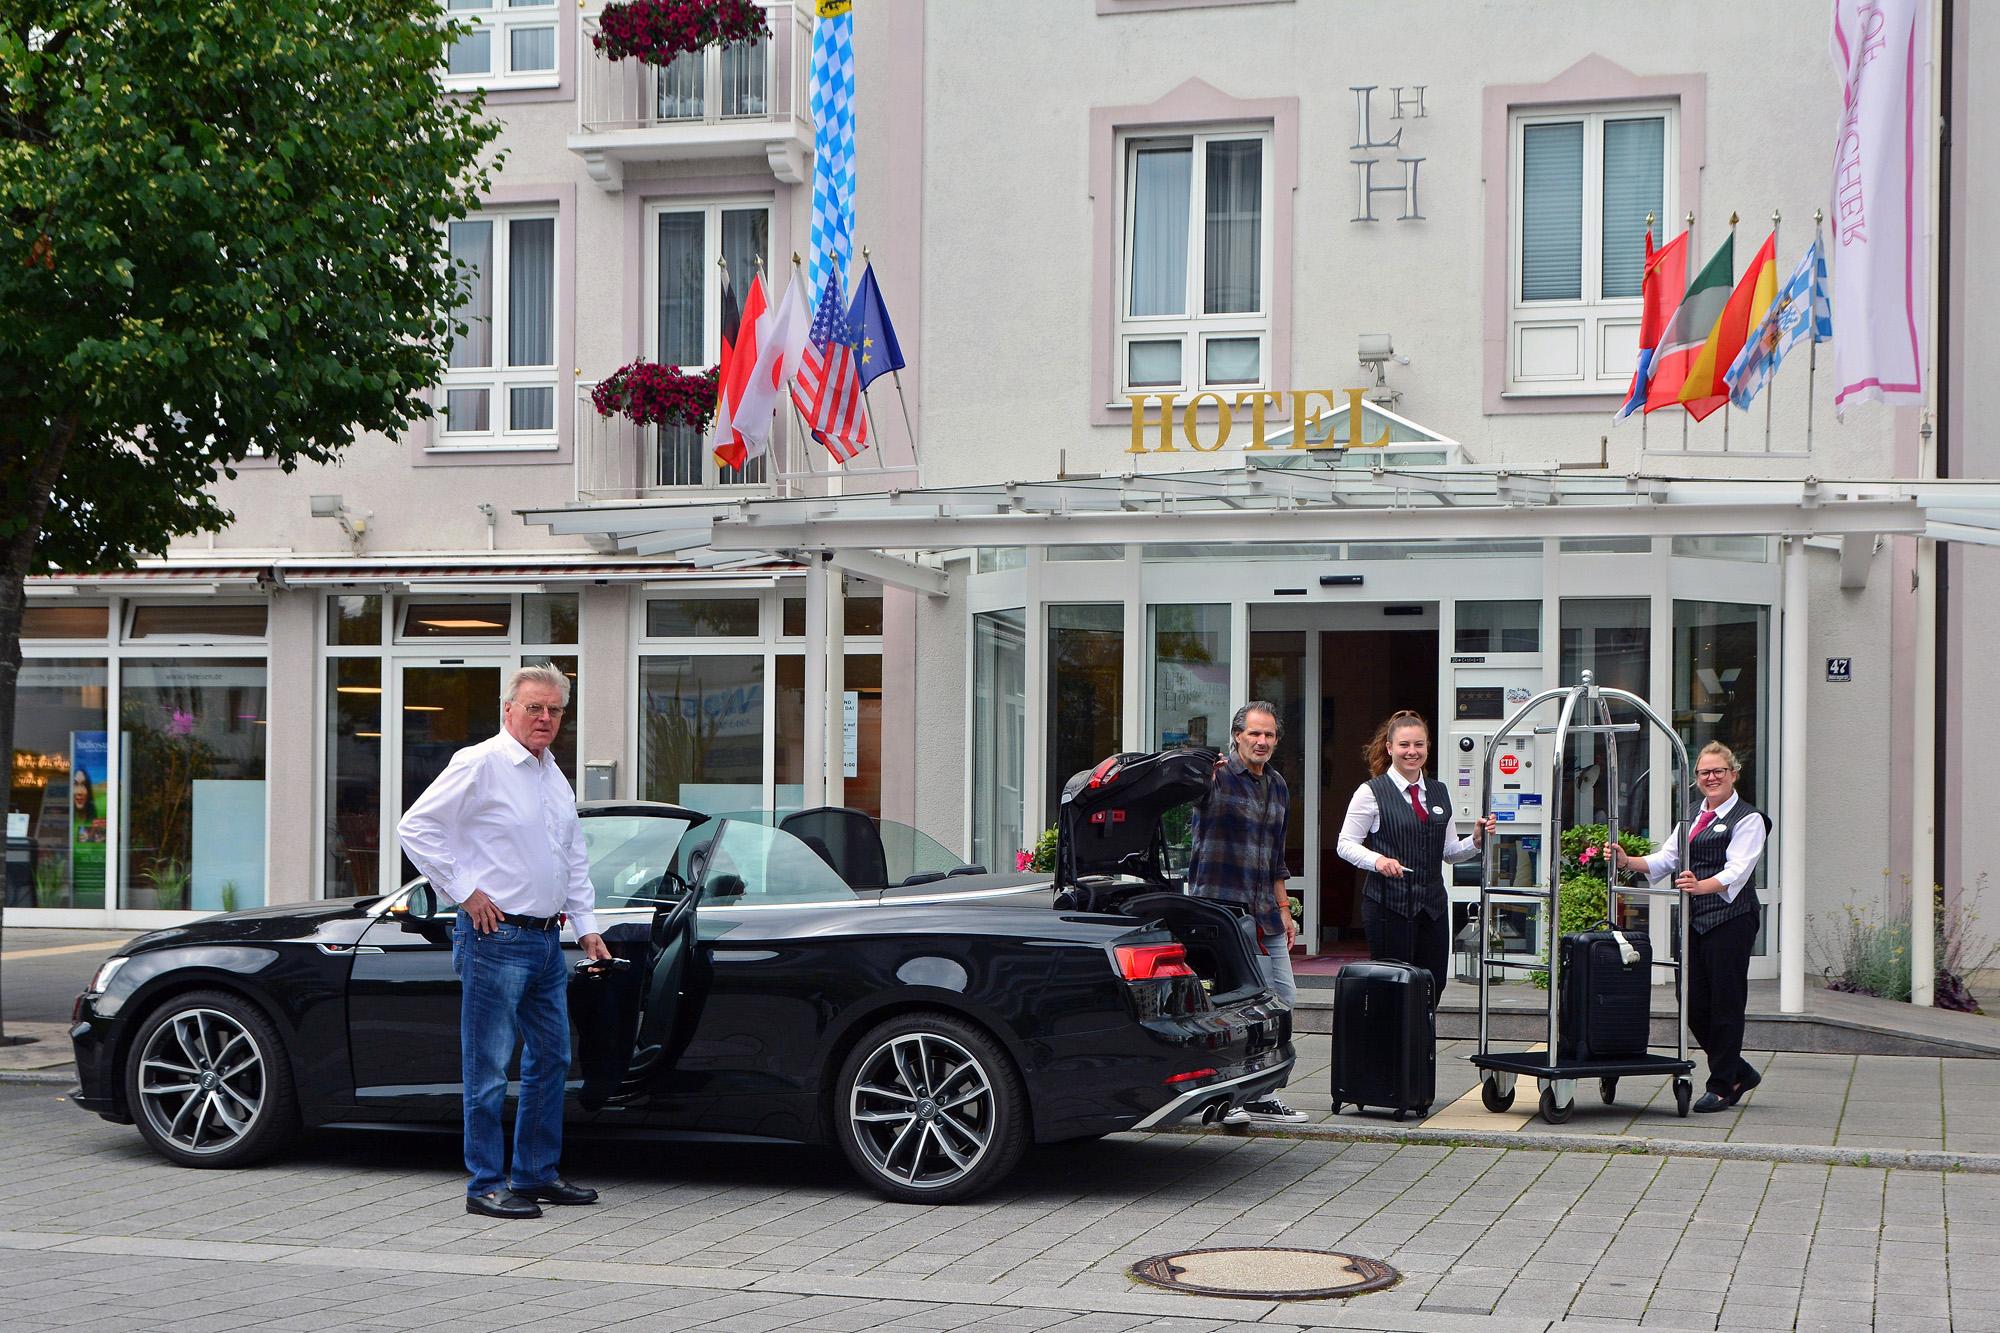 Hotel Lindacher Hof